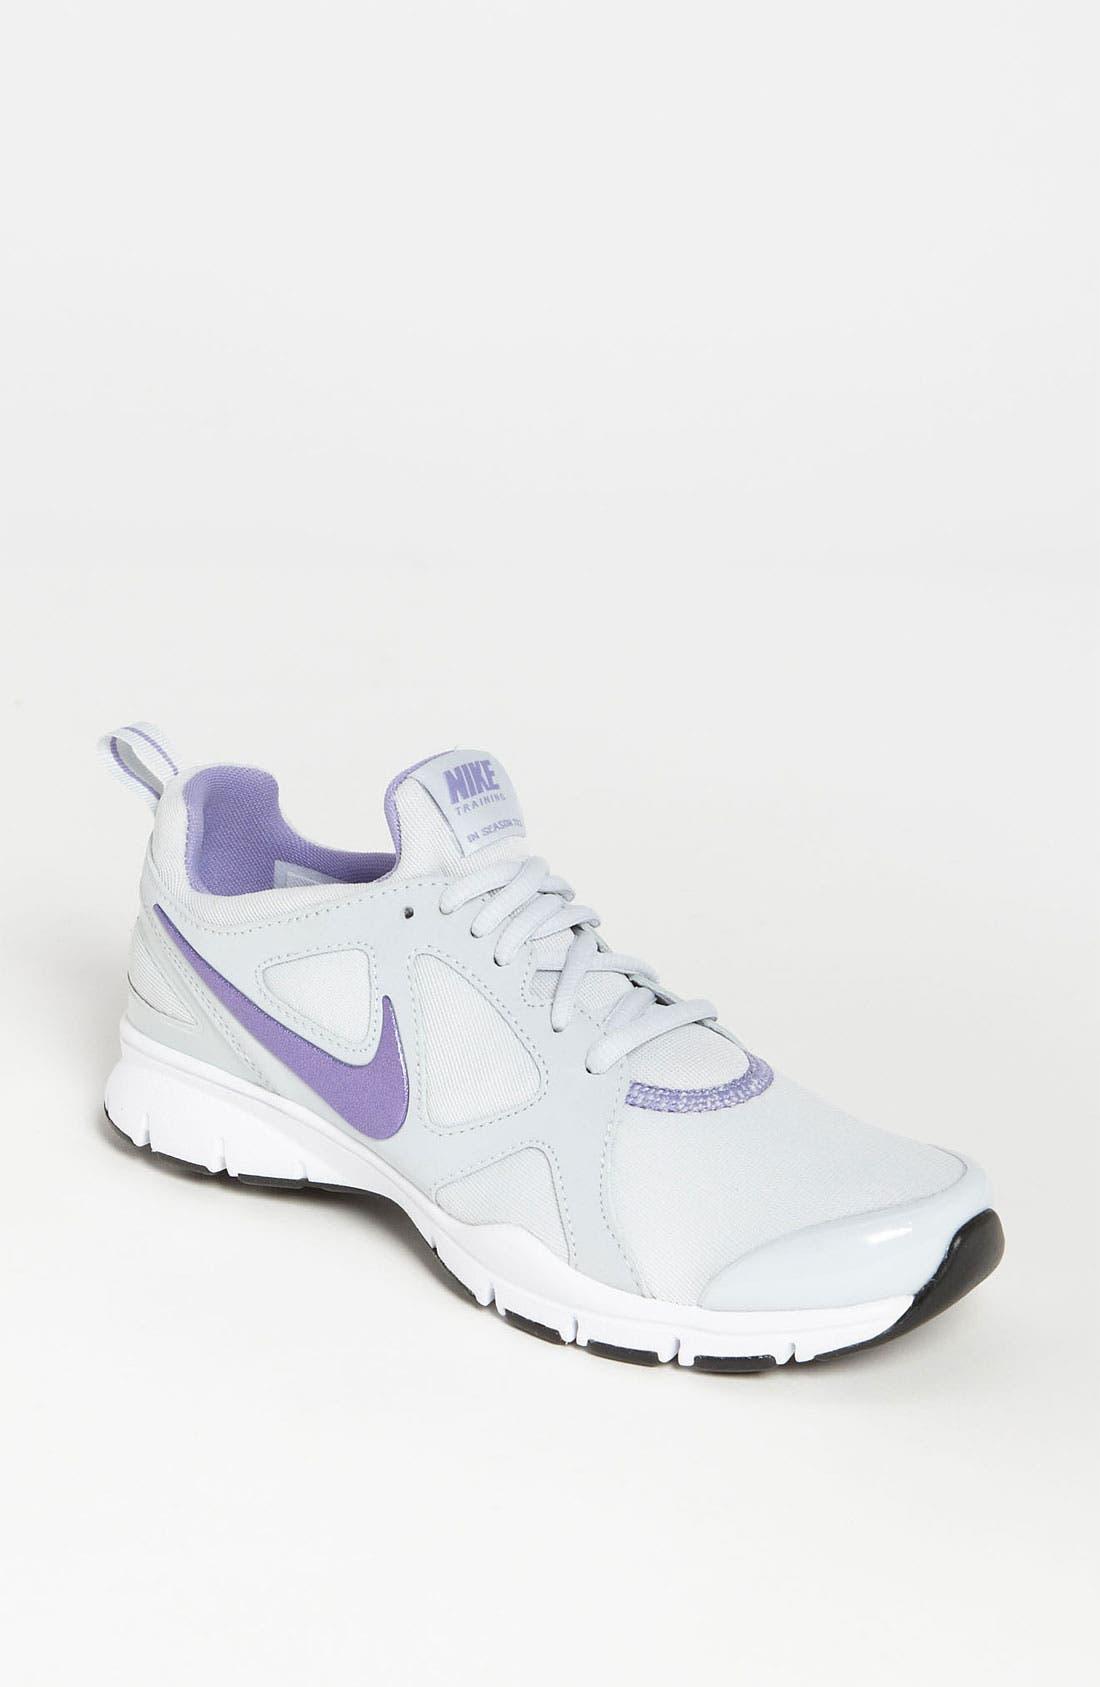 Alternate Image 1 Selected - Nike 'In Season 2' Training Shoe (Women)